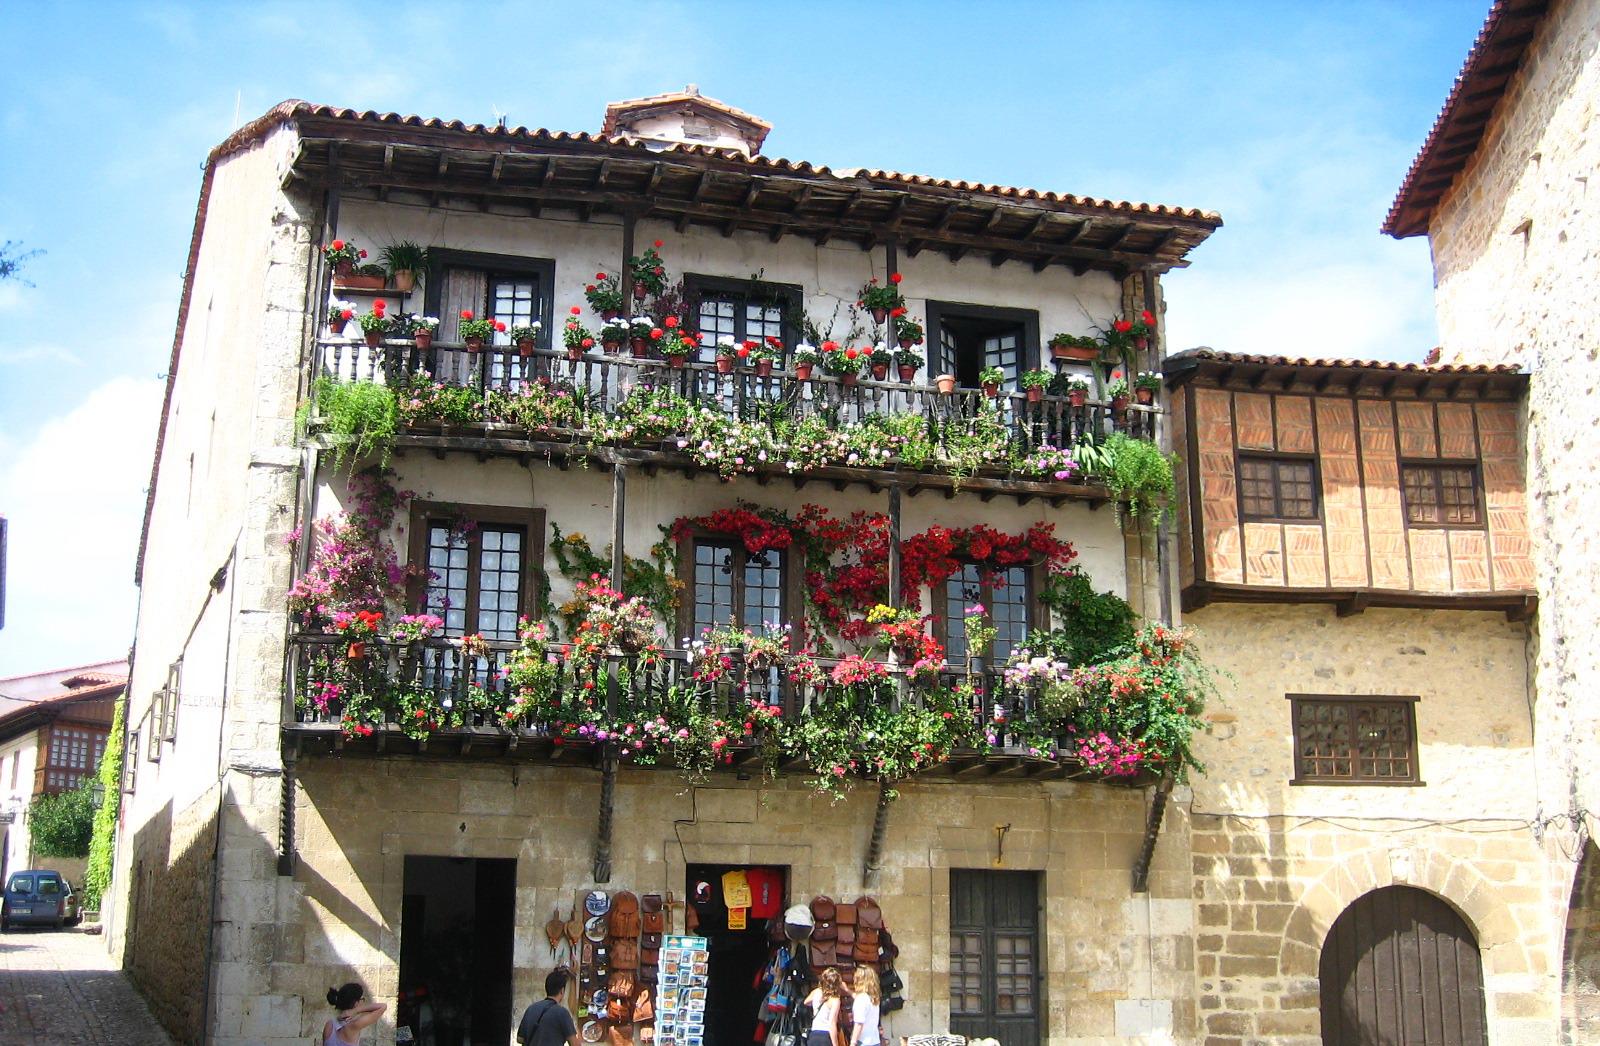 Fondos de pantalla ventana flores calle edificio - Casas gratis en pueblos de espana ...